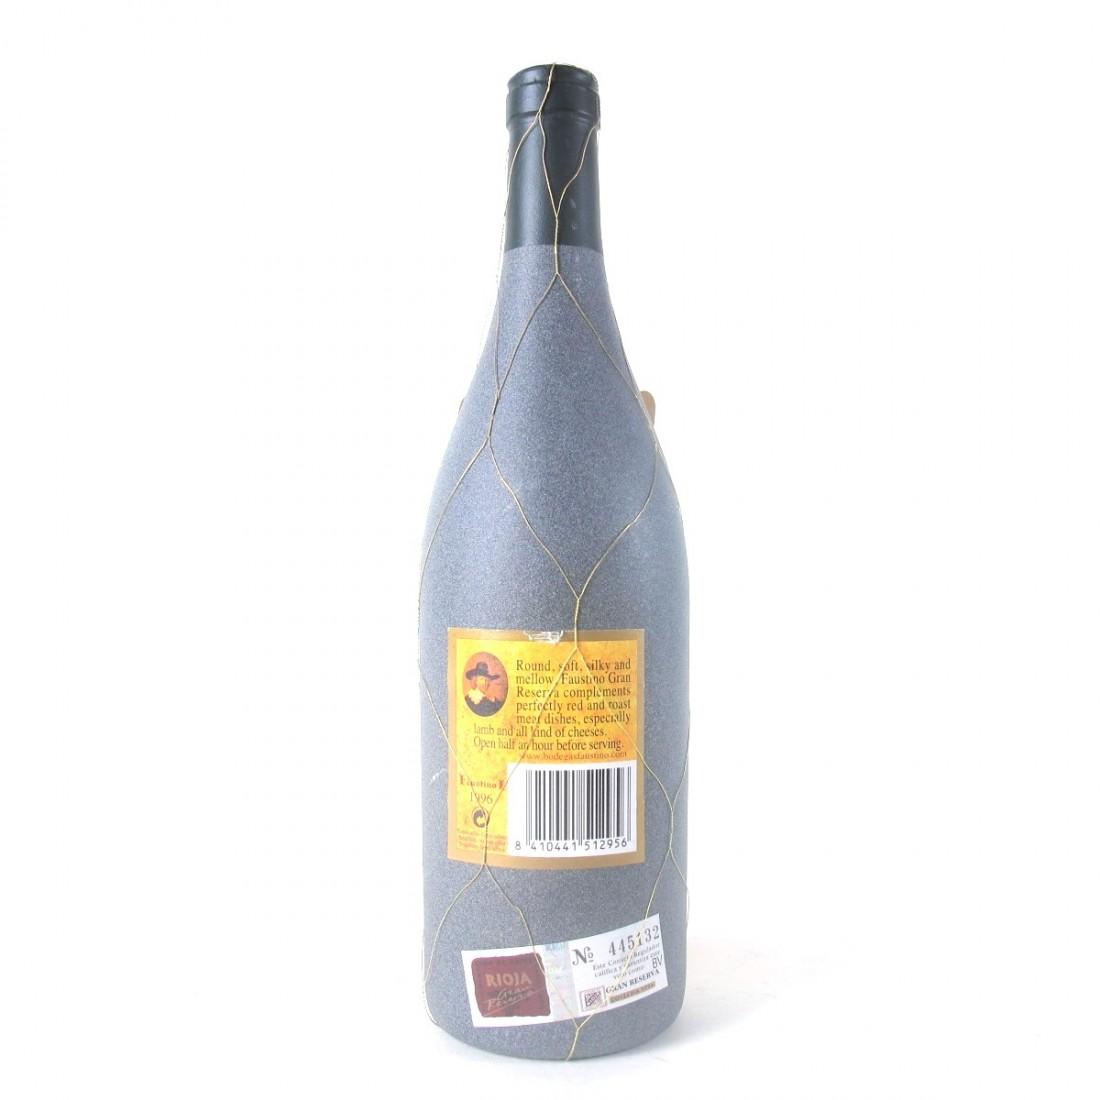 Faustino 1996 Rioja Gran Reserva